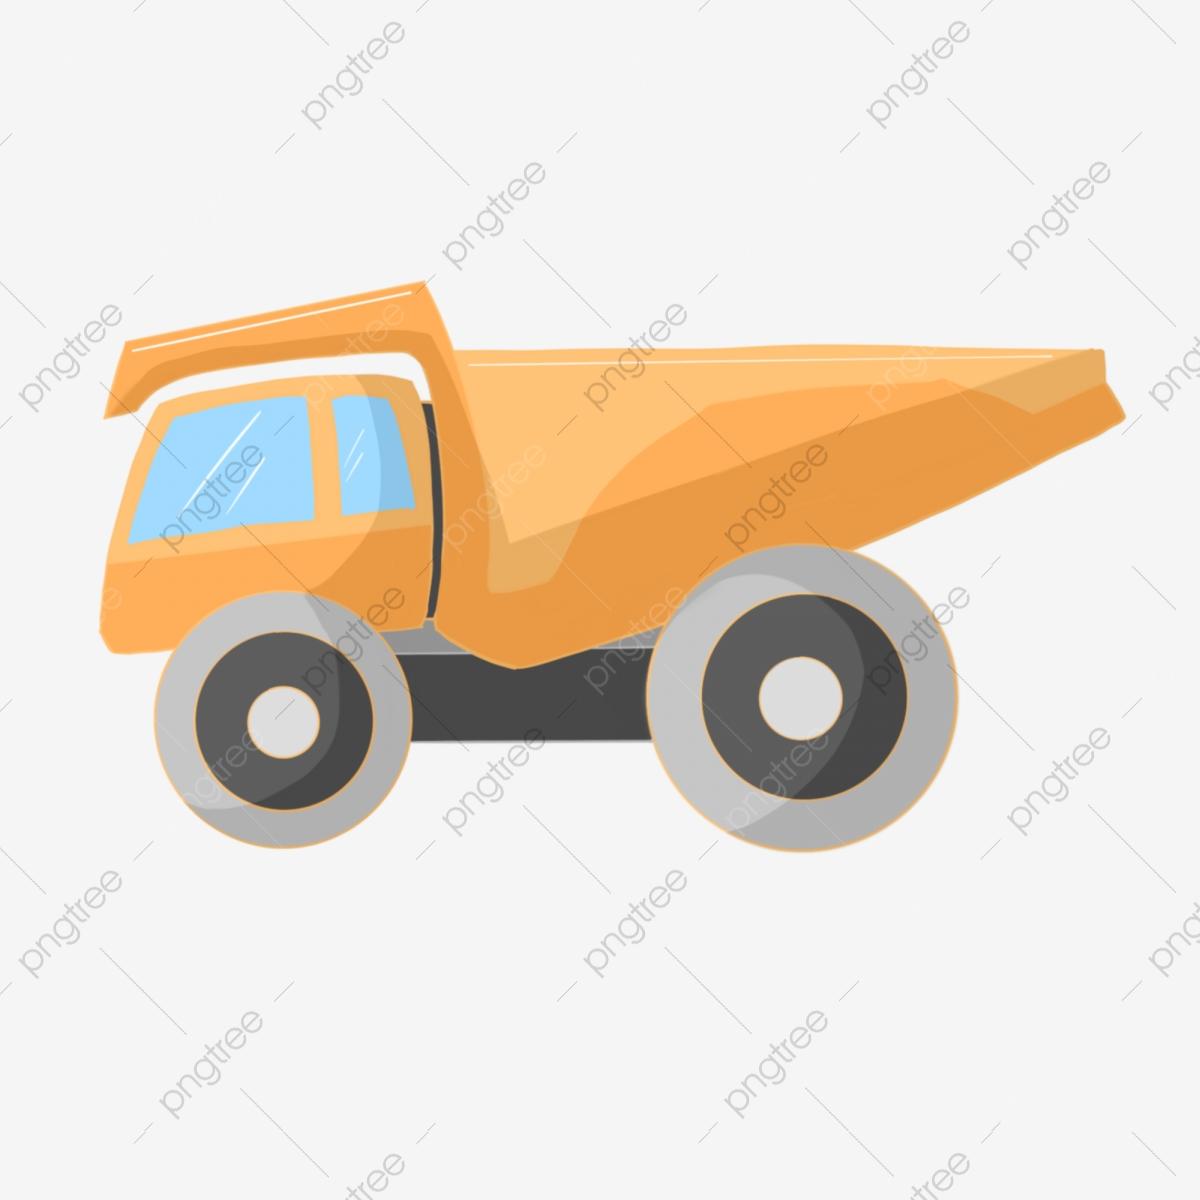 Engineering clipart car engineer. Mechanical engineers wrench cap